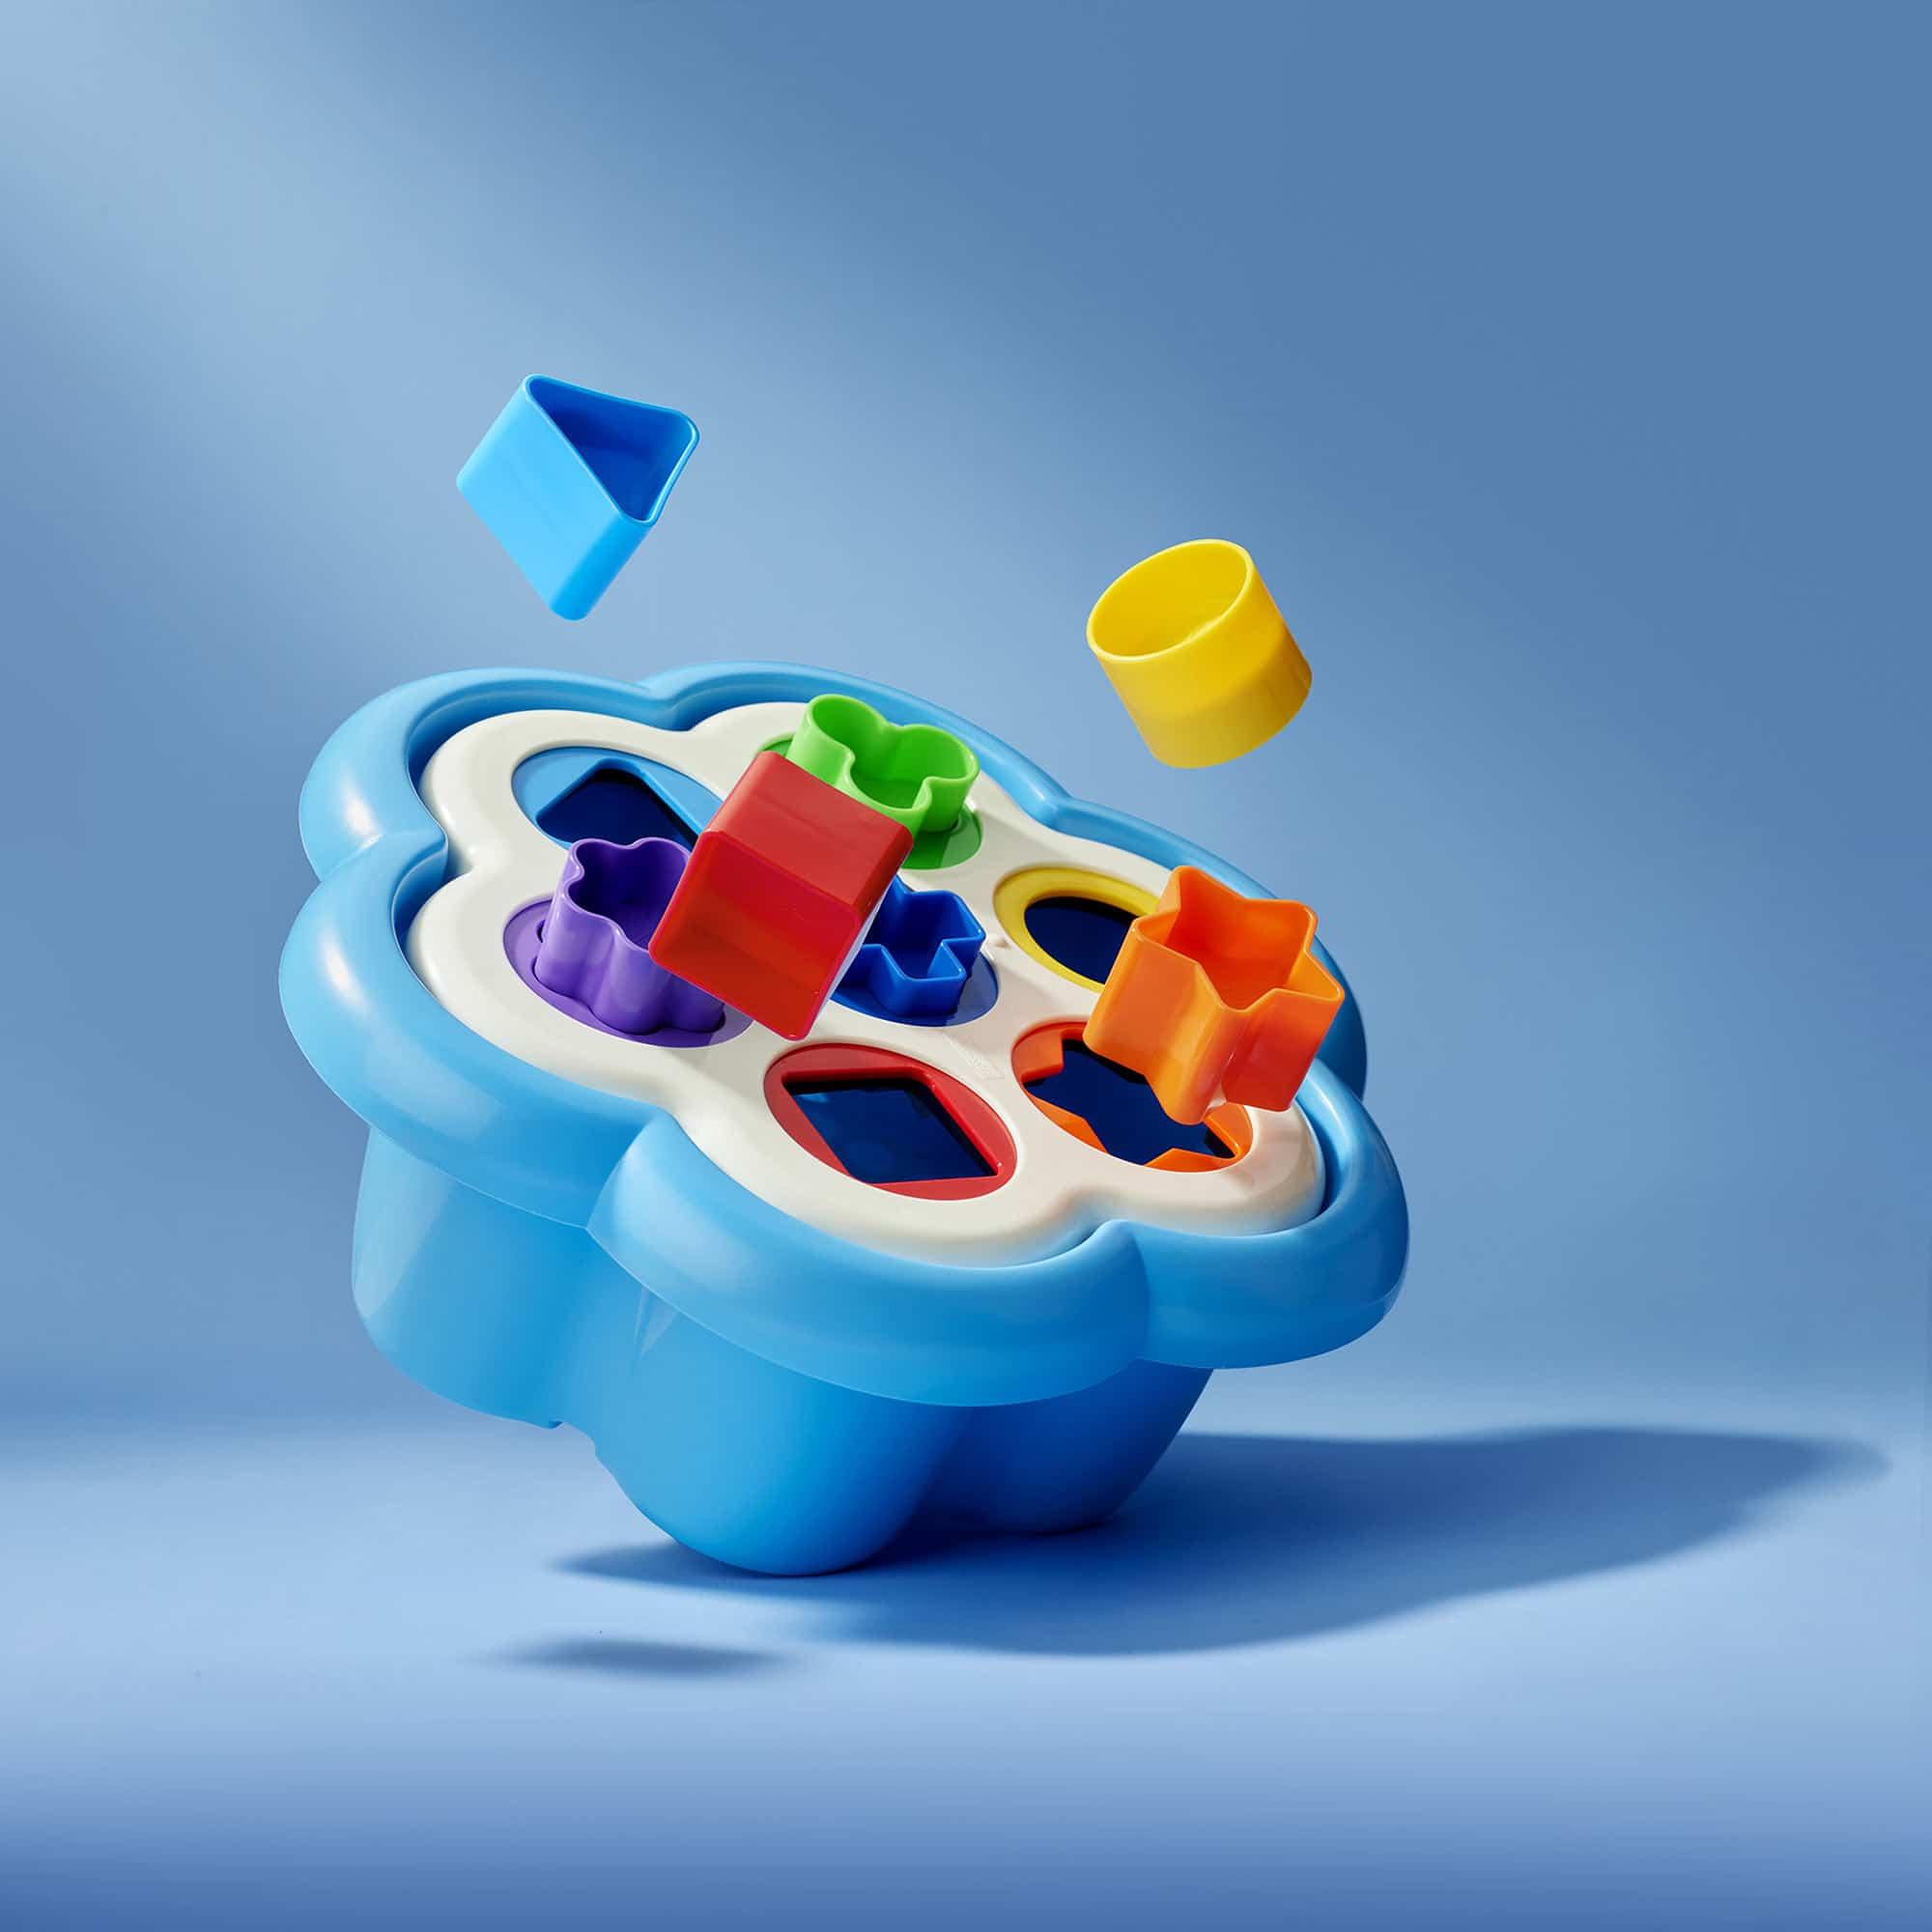 Blue Kids Toy Still Life Shot for Corepla by Fotografando